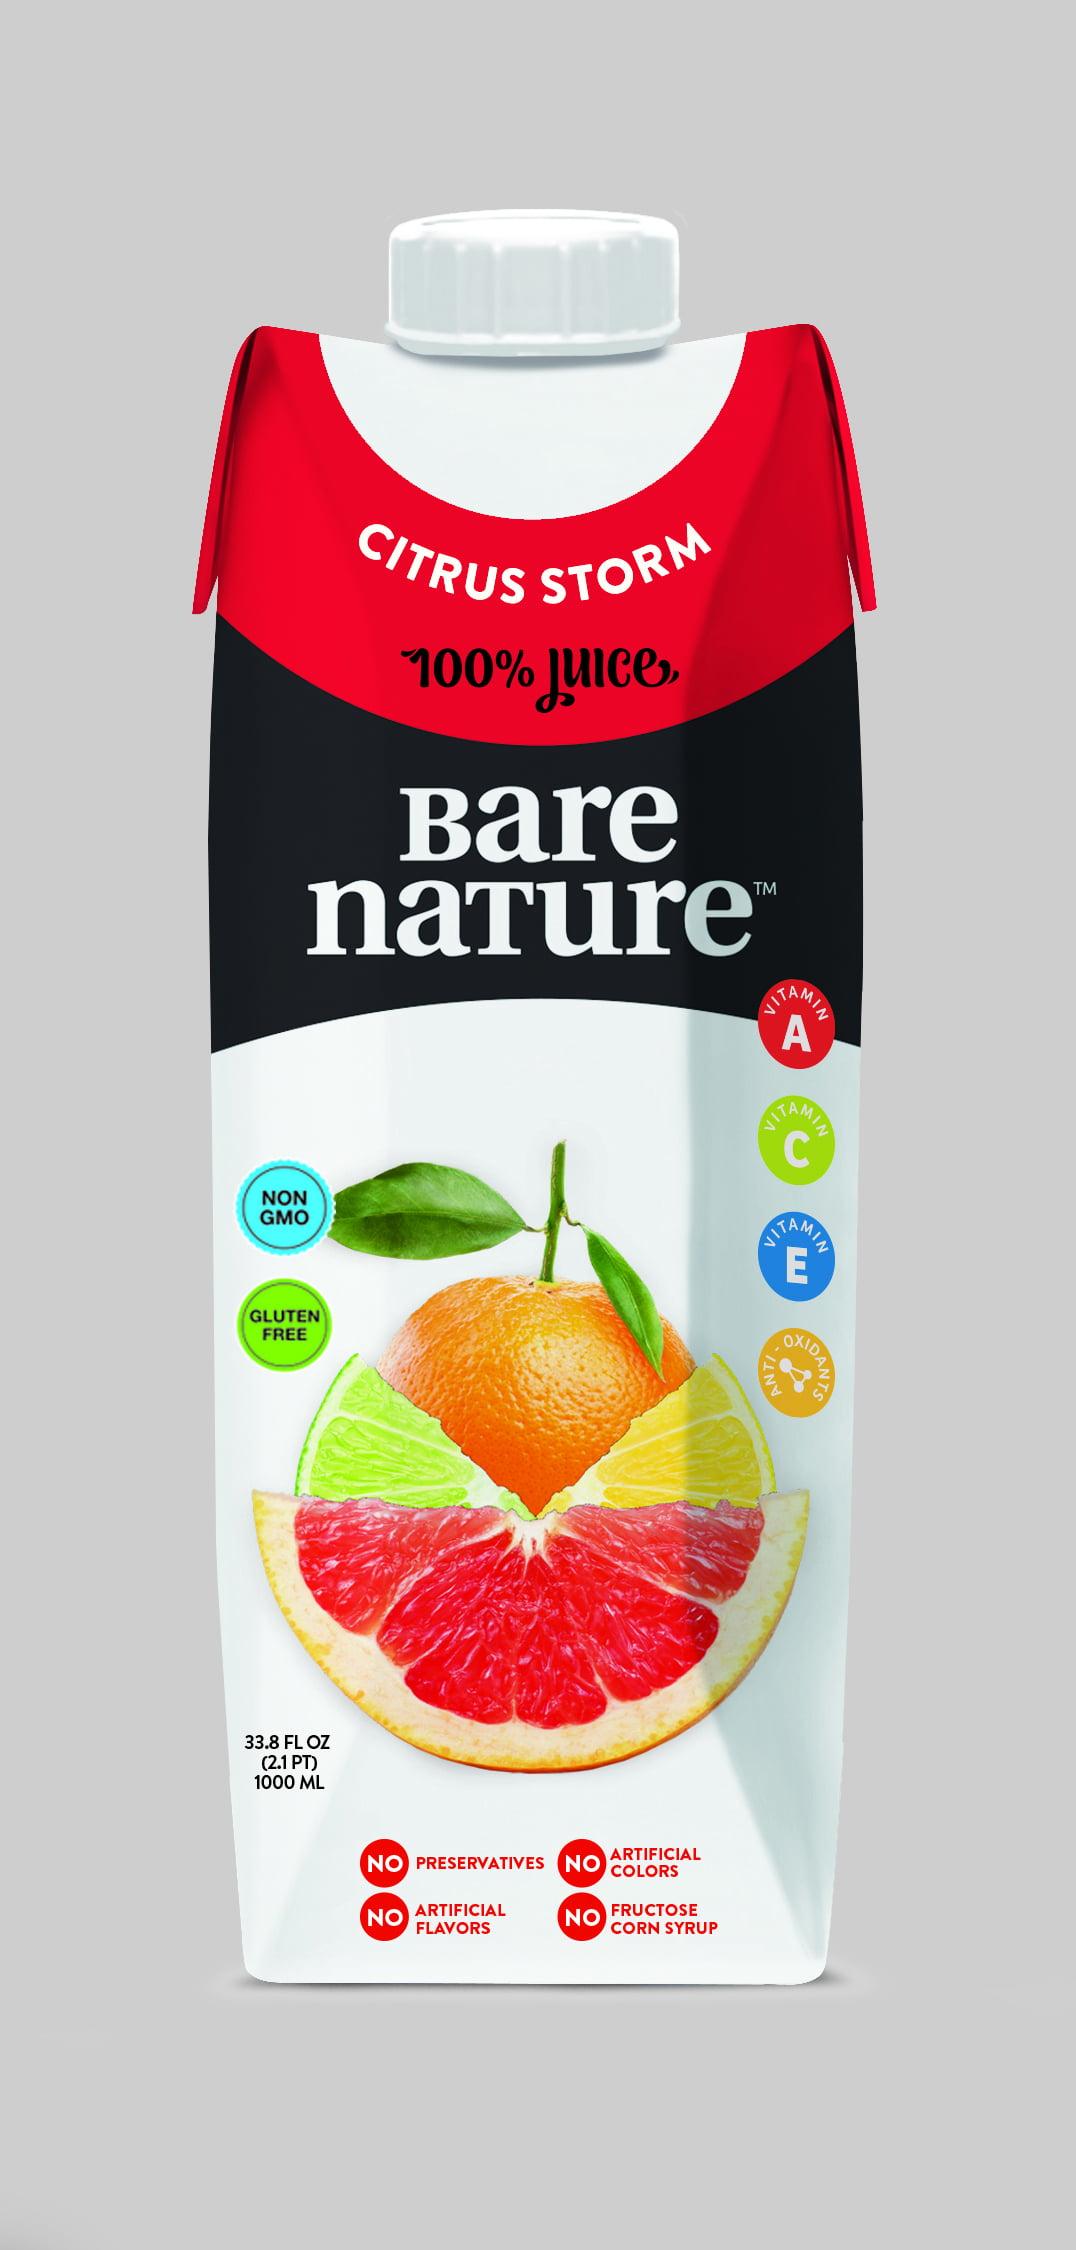 Bare Nature Juice Citrus Storm, 33.8 Fl. Oz. Tetra Pak (1L), 6 Ct by Vink and Beri, LLC